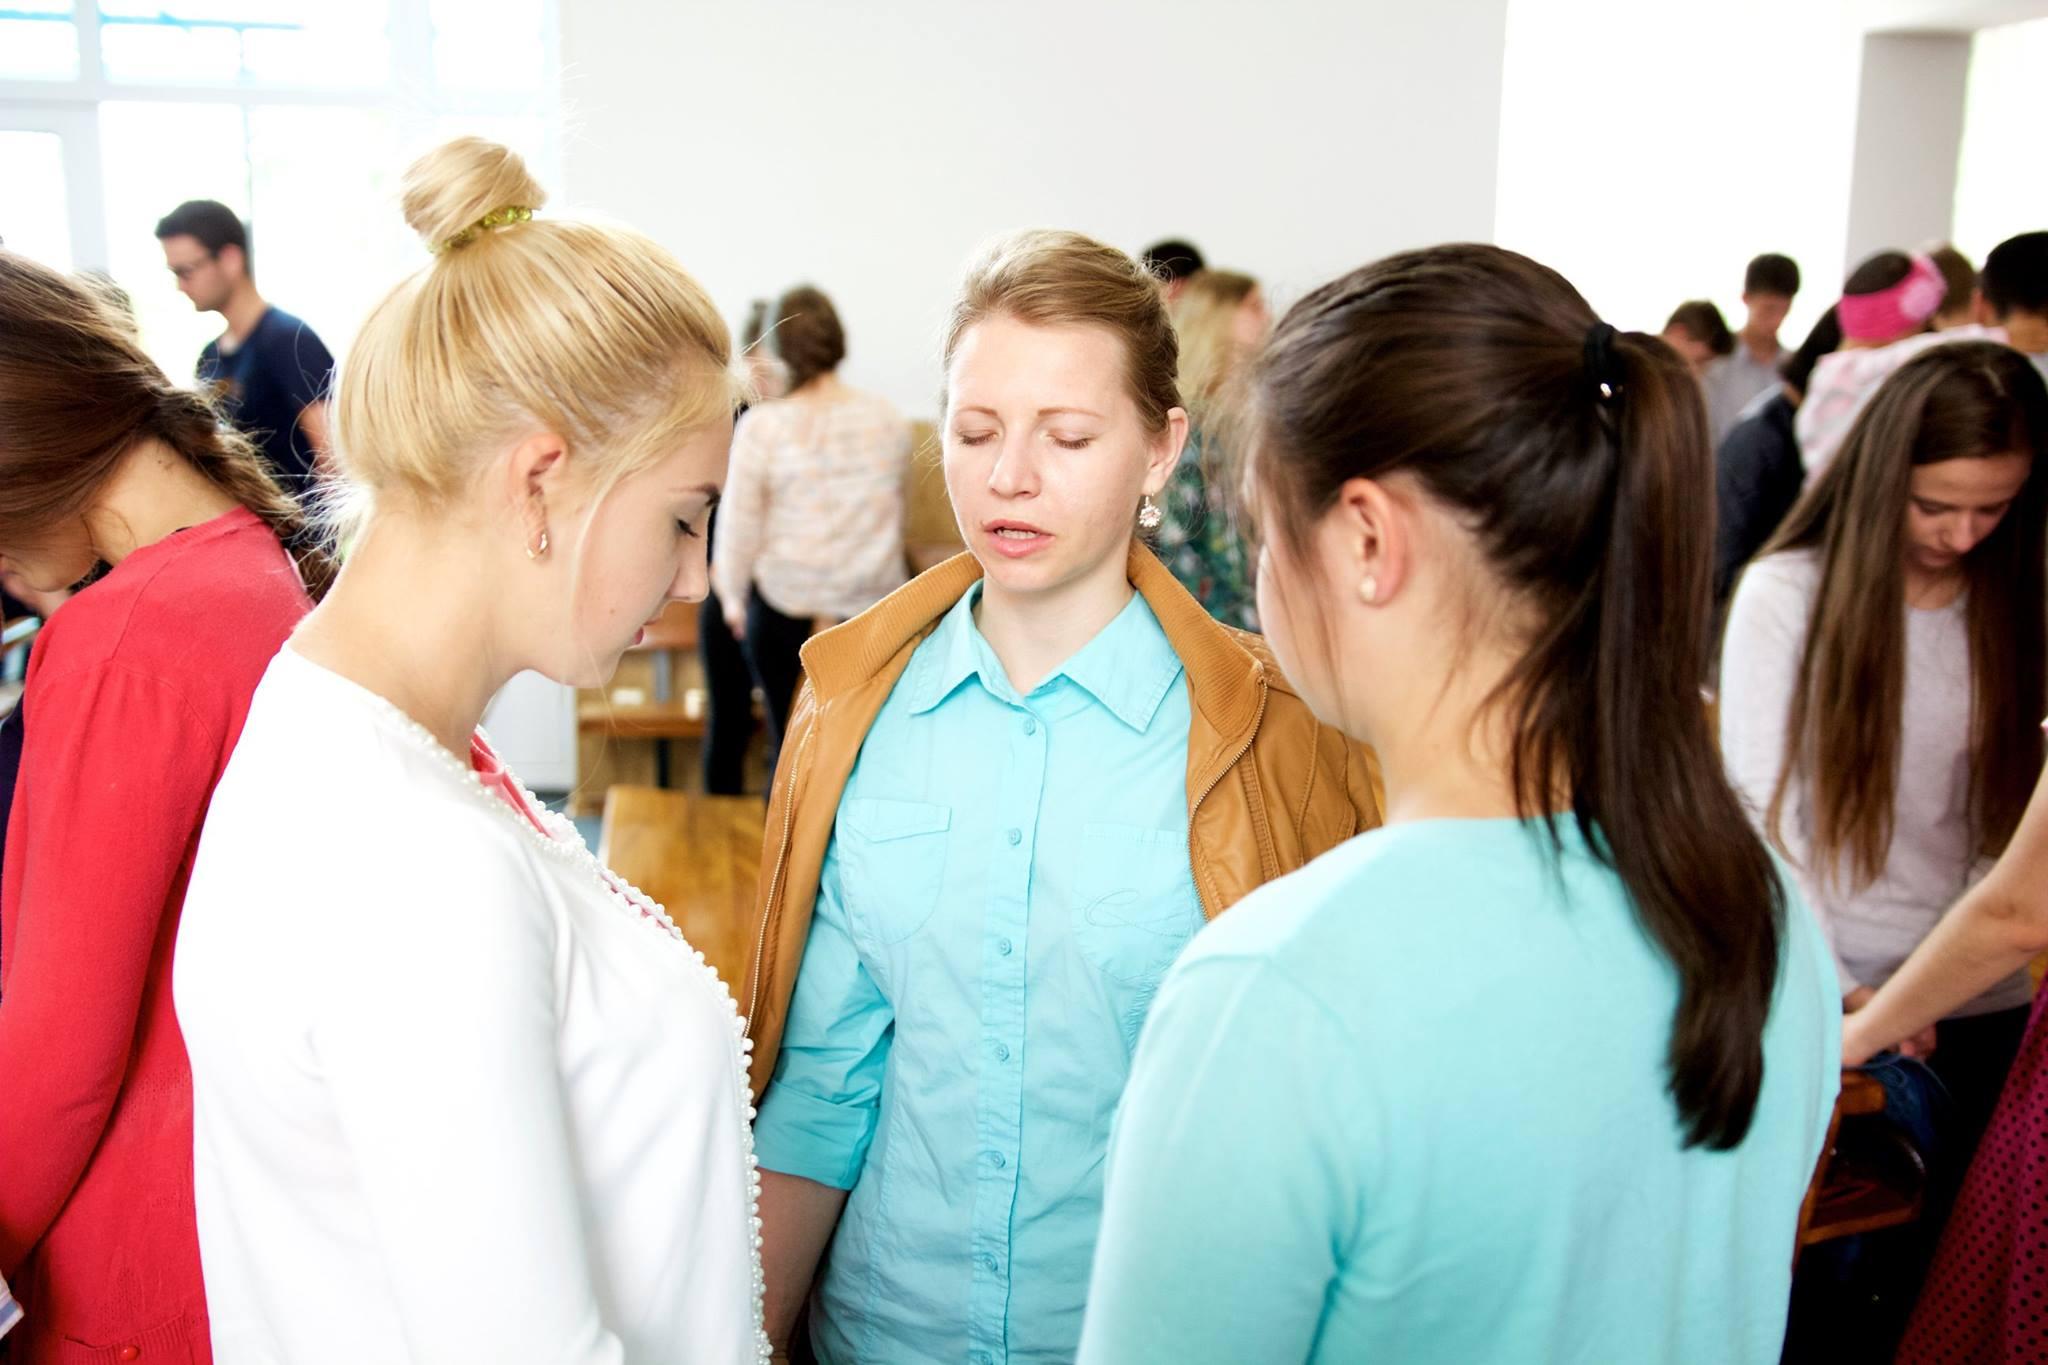 pocăință prin site-ul www.moldovacrestina.md